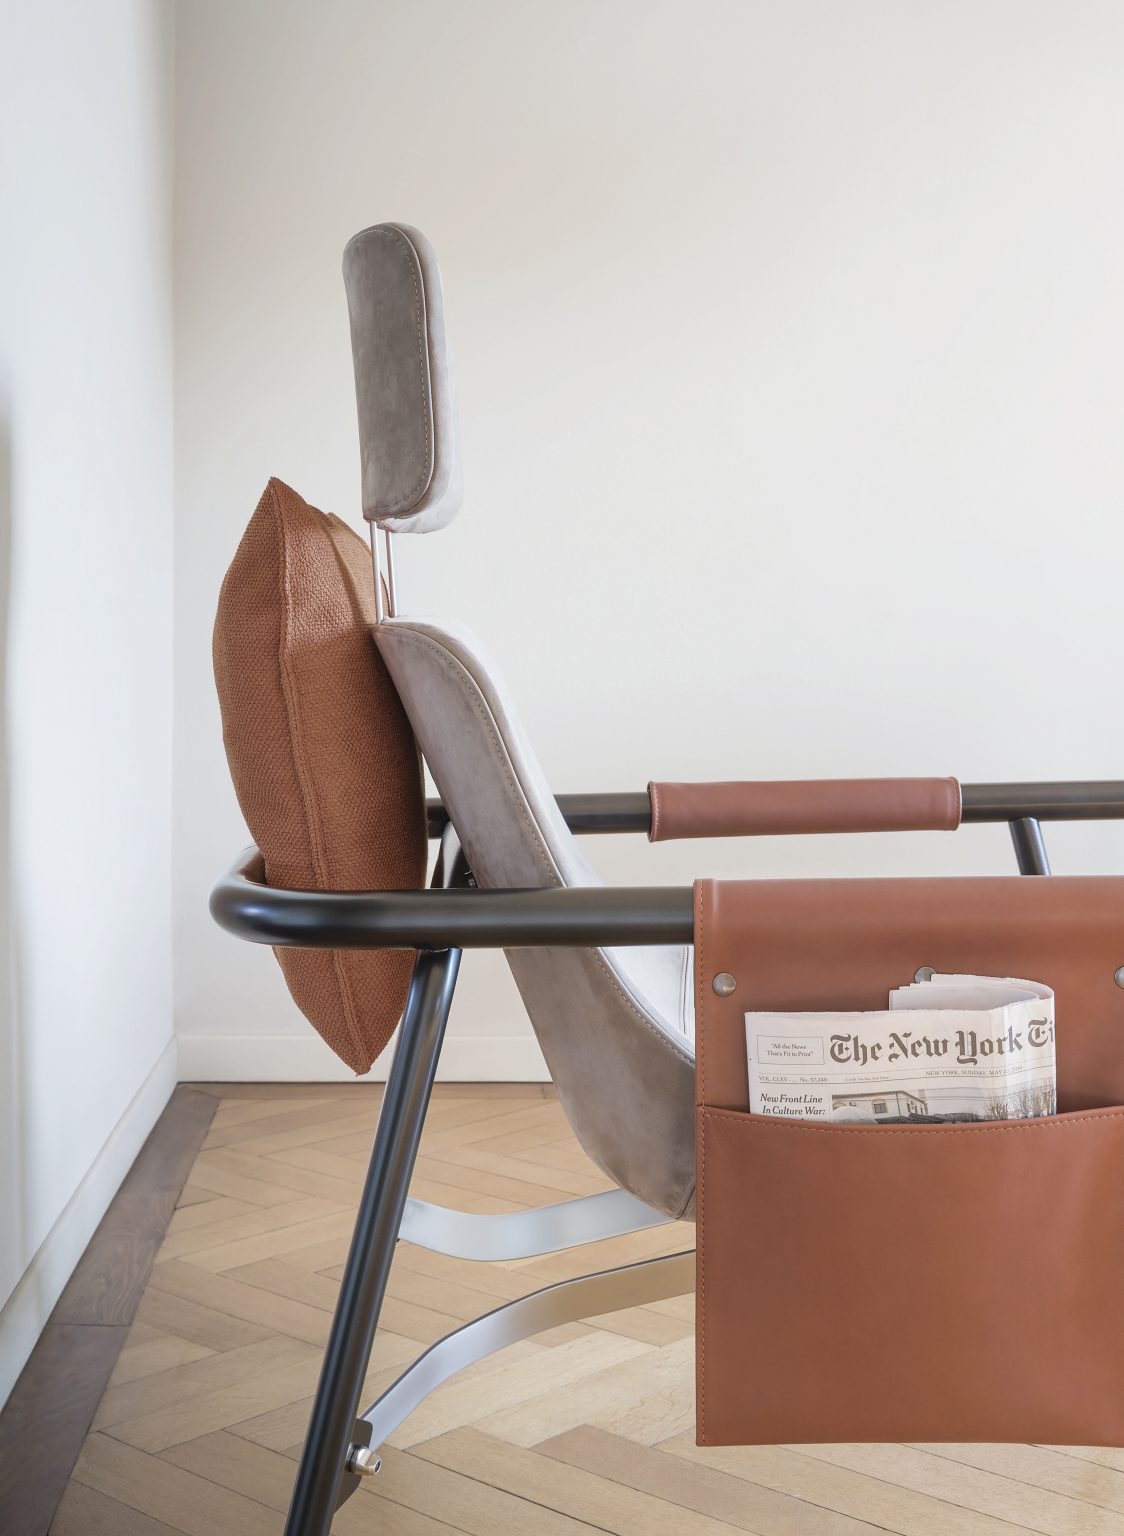 Biennale Interieur - Belgium's leading design and interior event - Remind_eddy-up-2.jpg